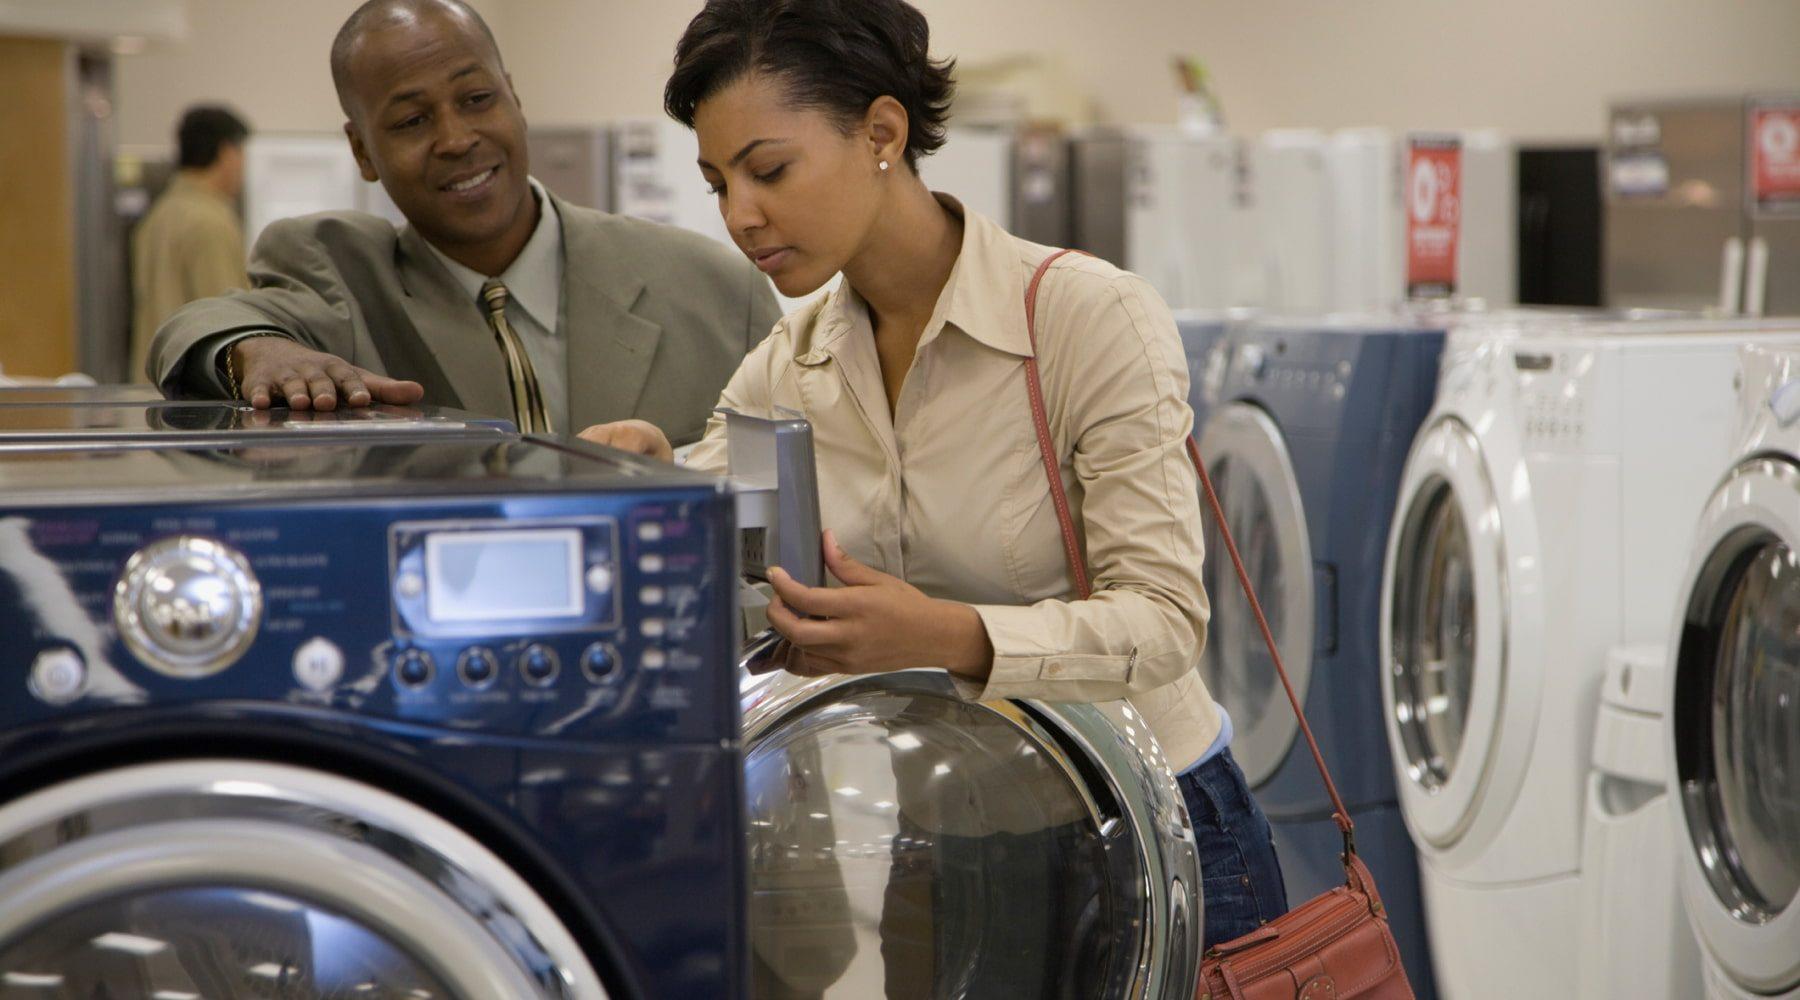 Best Black Friday appliance deals